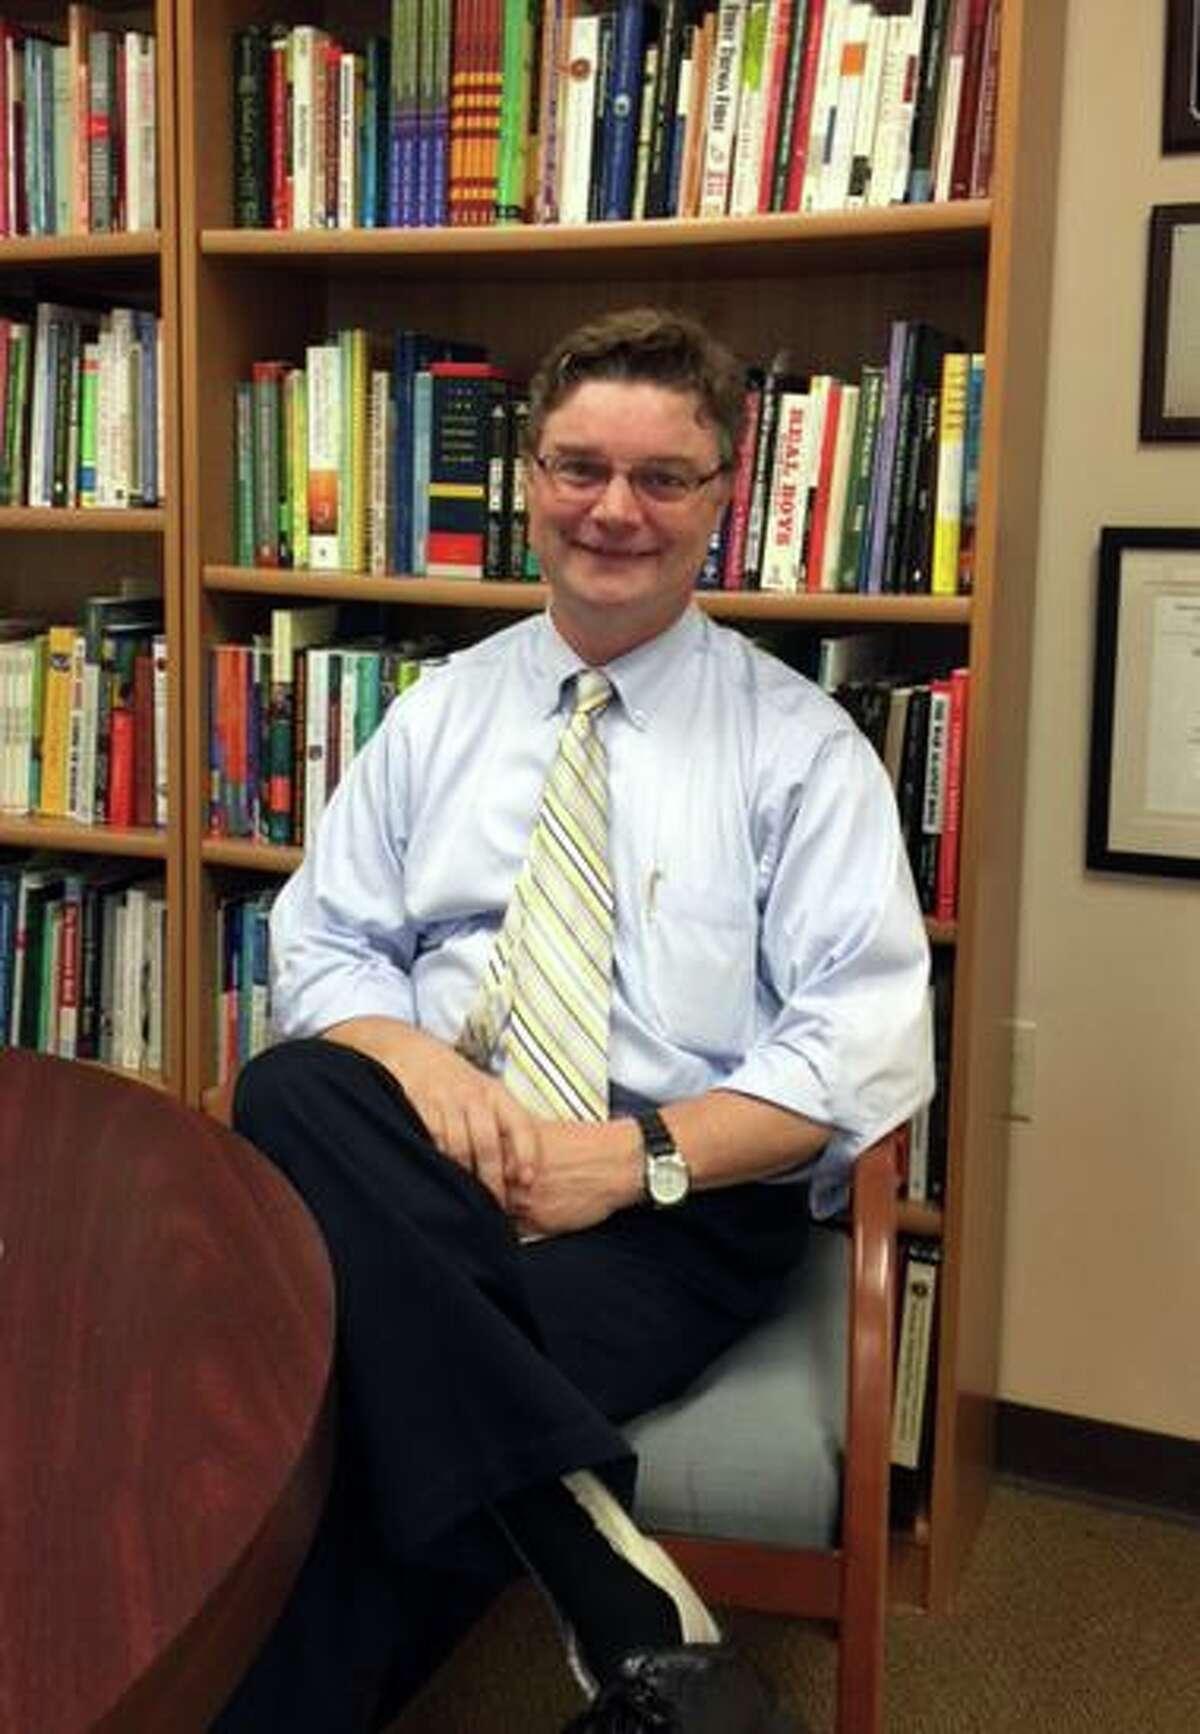 Dr. Thomas McMorran, interim superintendent for Easton, Redding and Region 9 schools.